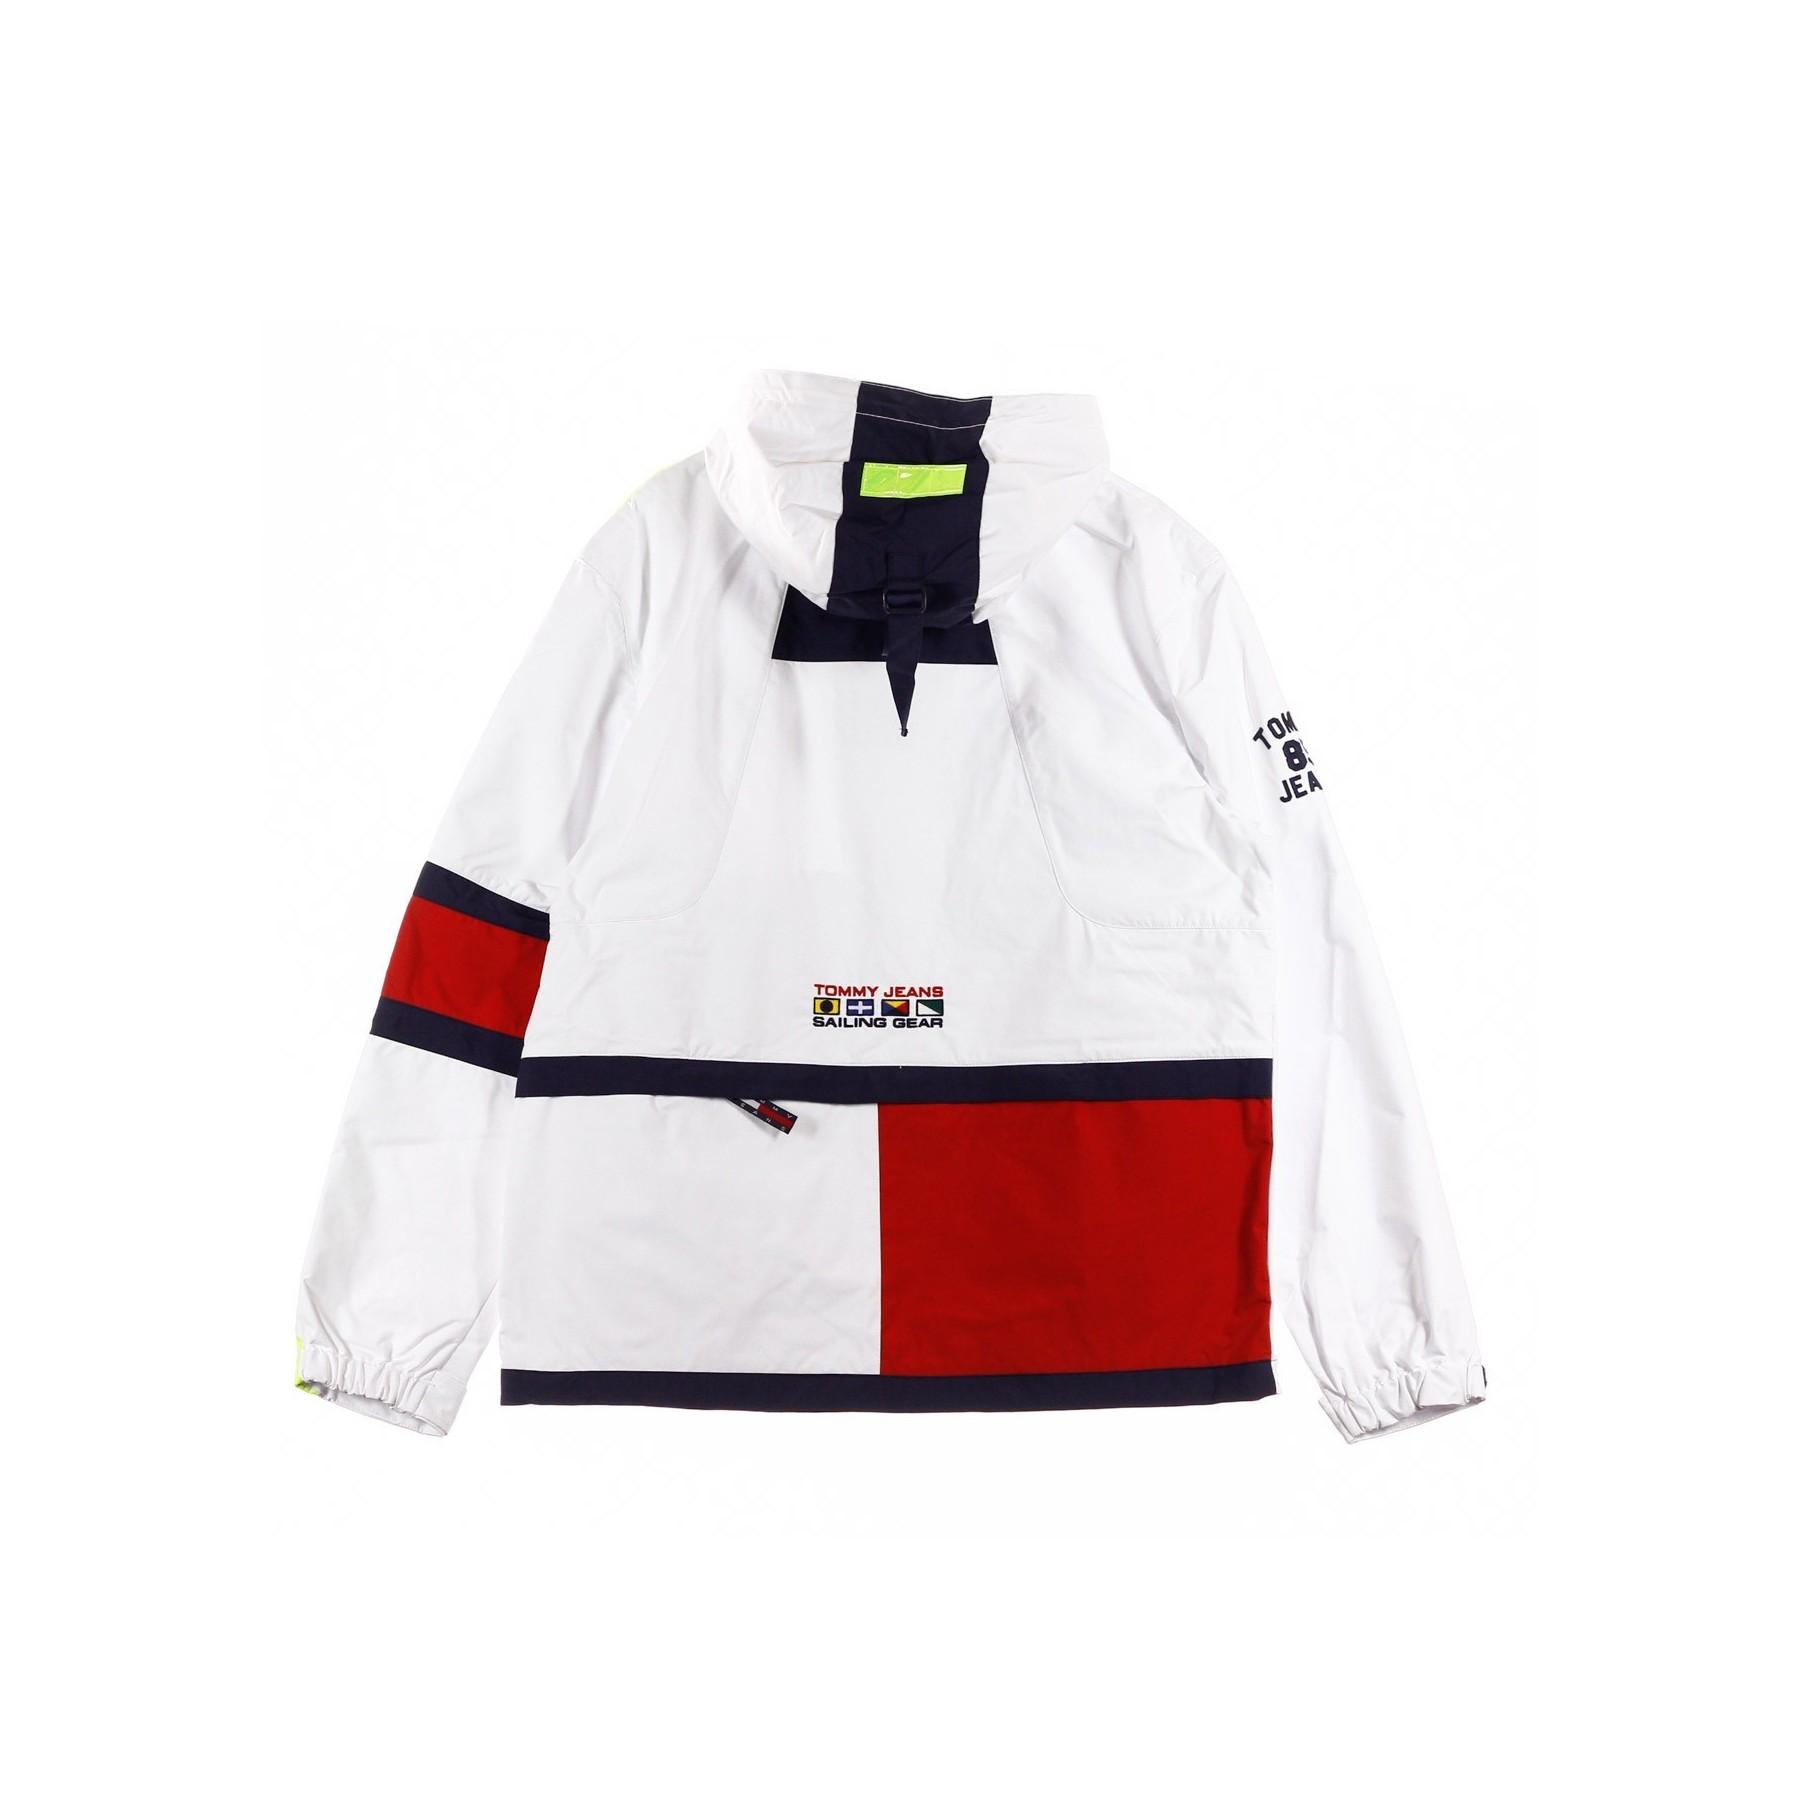 Anorak Tjm 90s Sailing Jacket Bright White Atipicishop Com